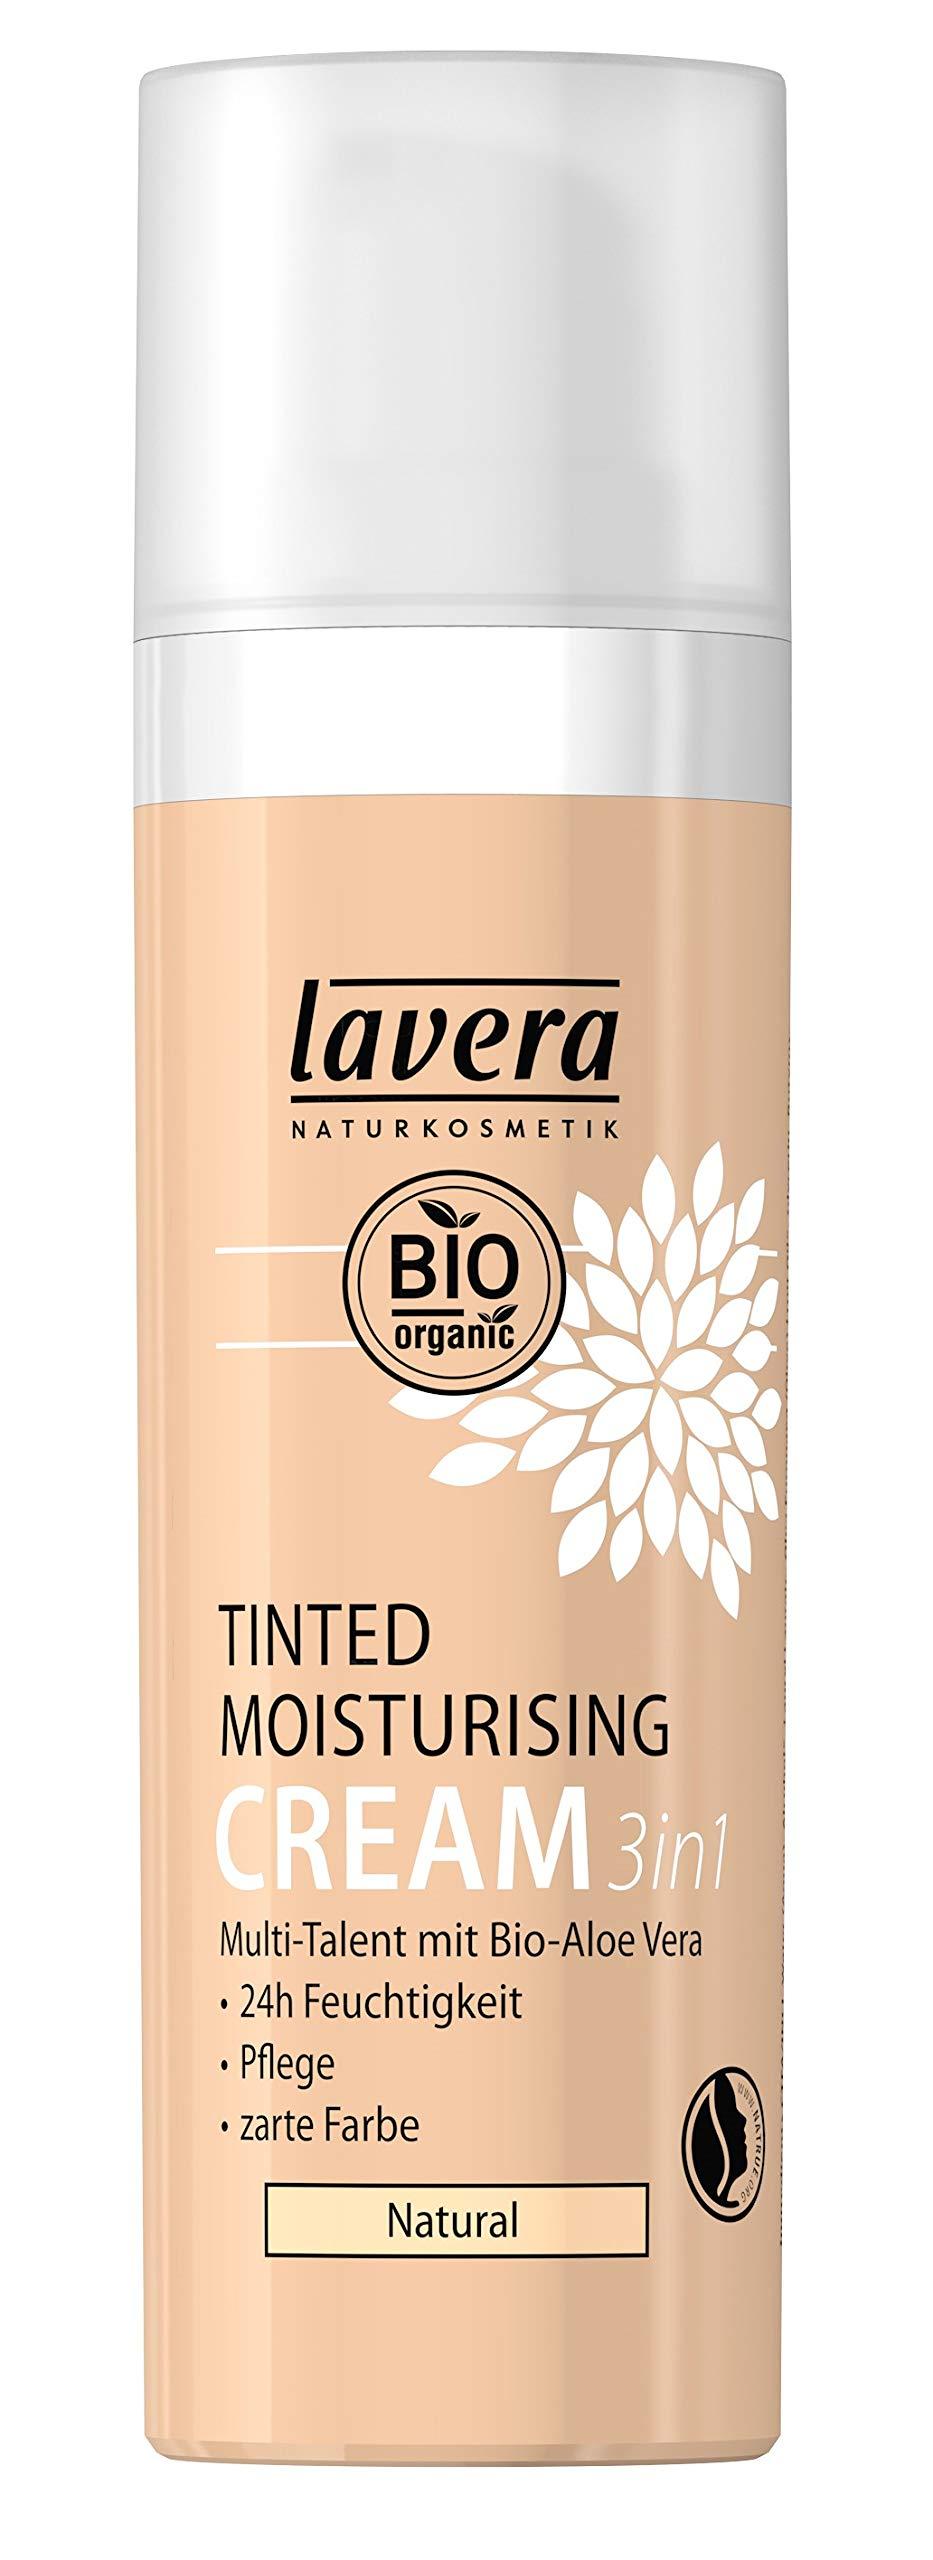 Lavera Tinted Moisturising Cream 3in1, Natural, 1 Ounce